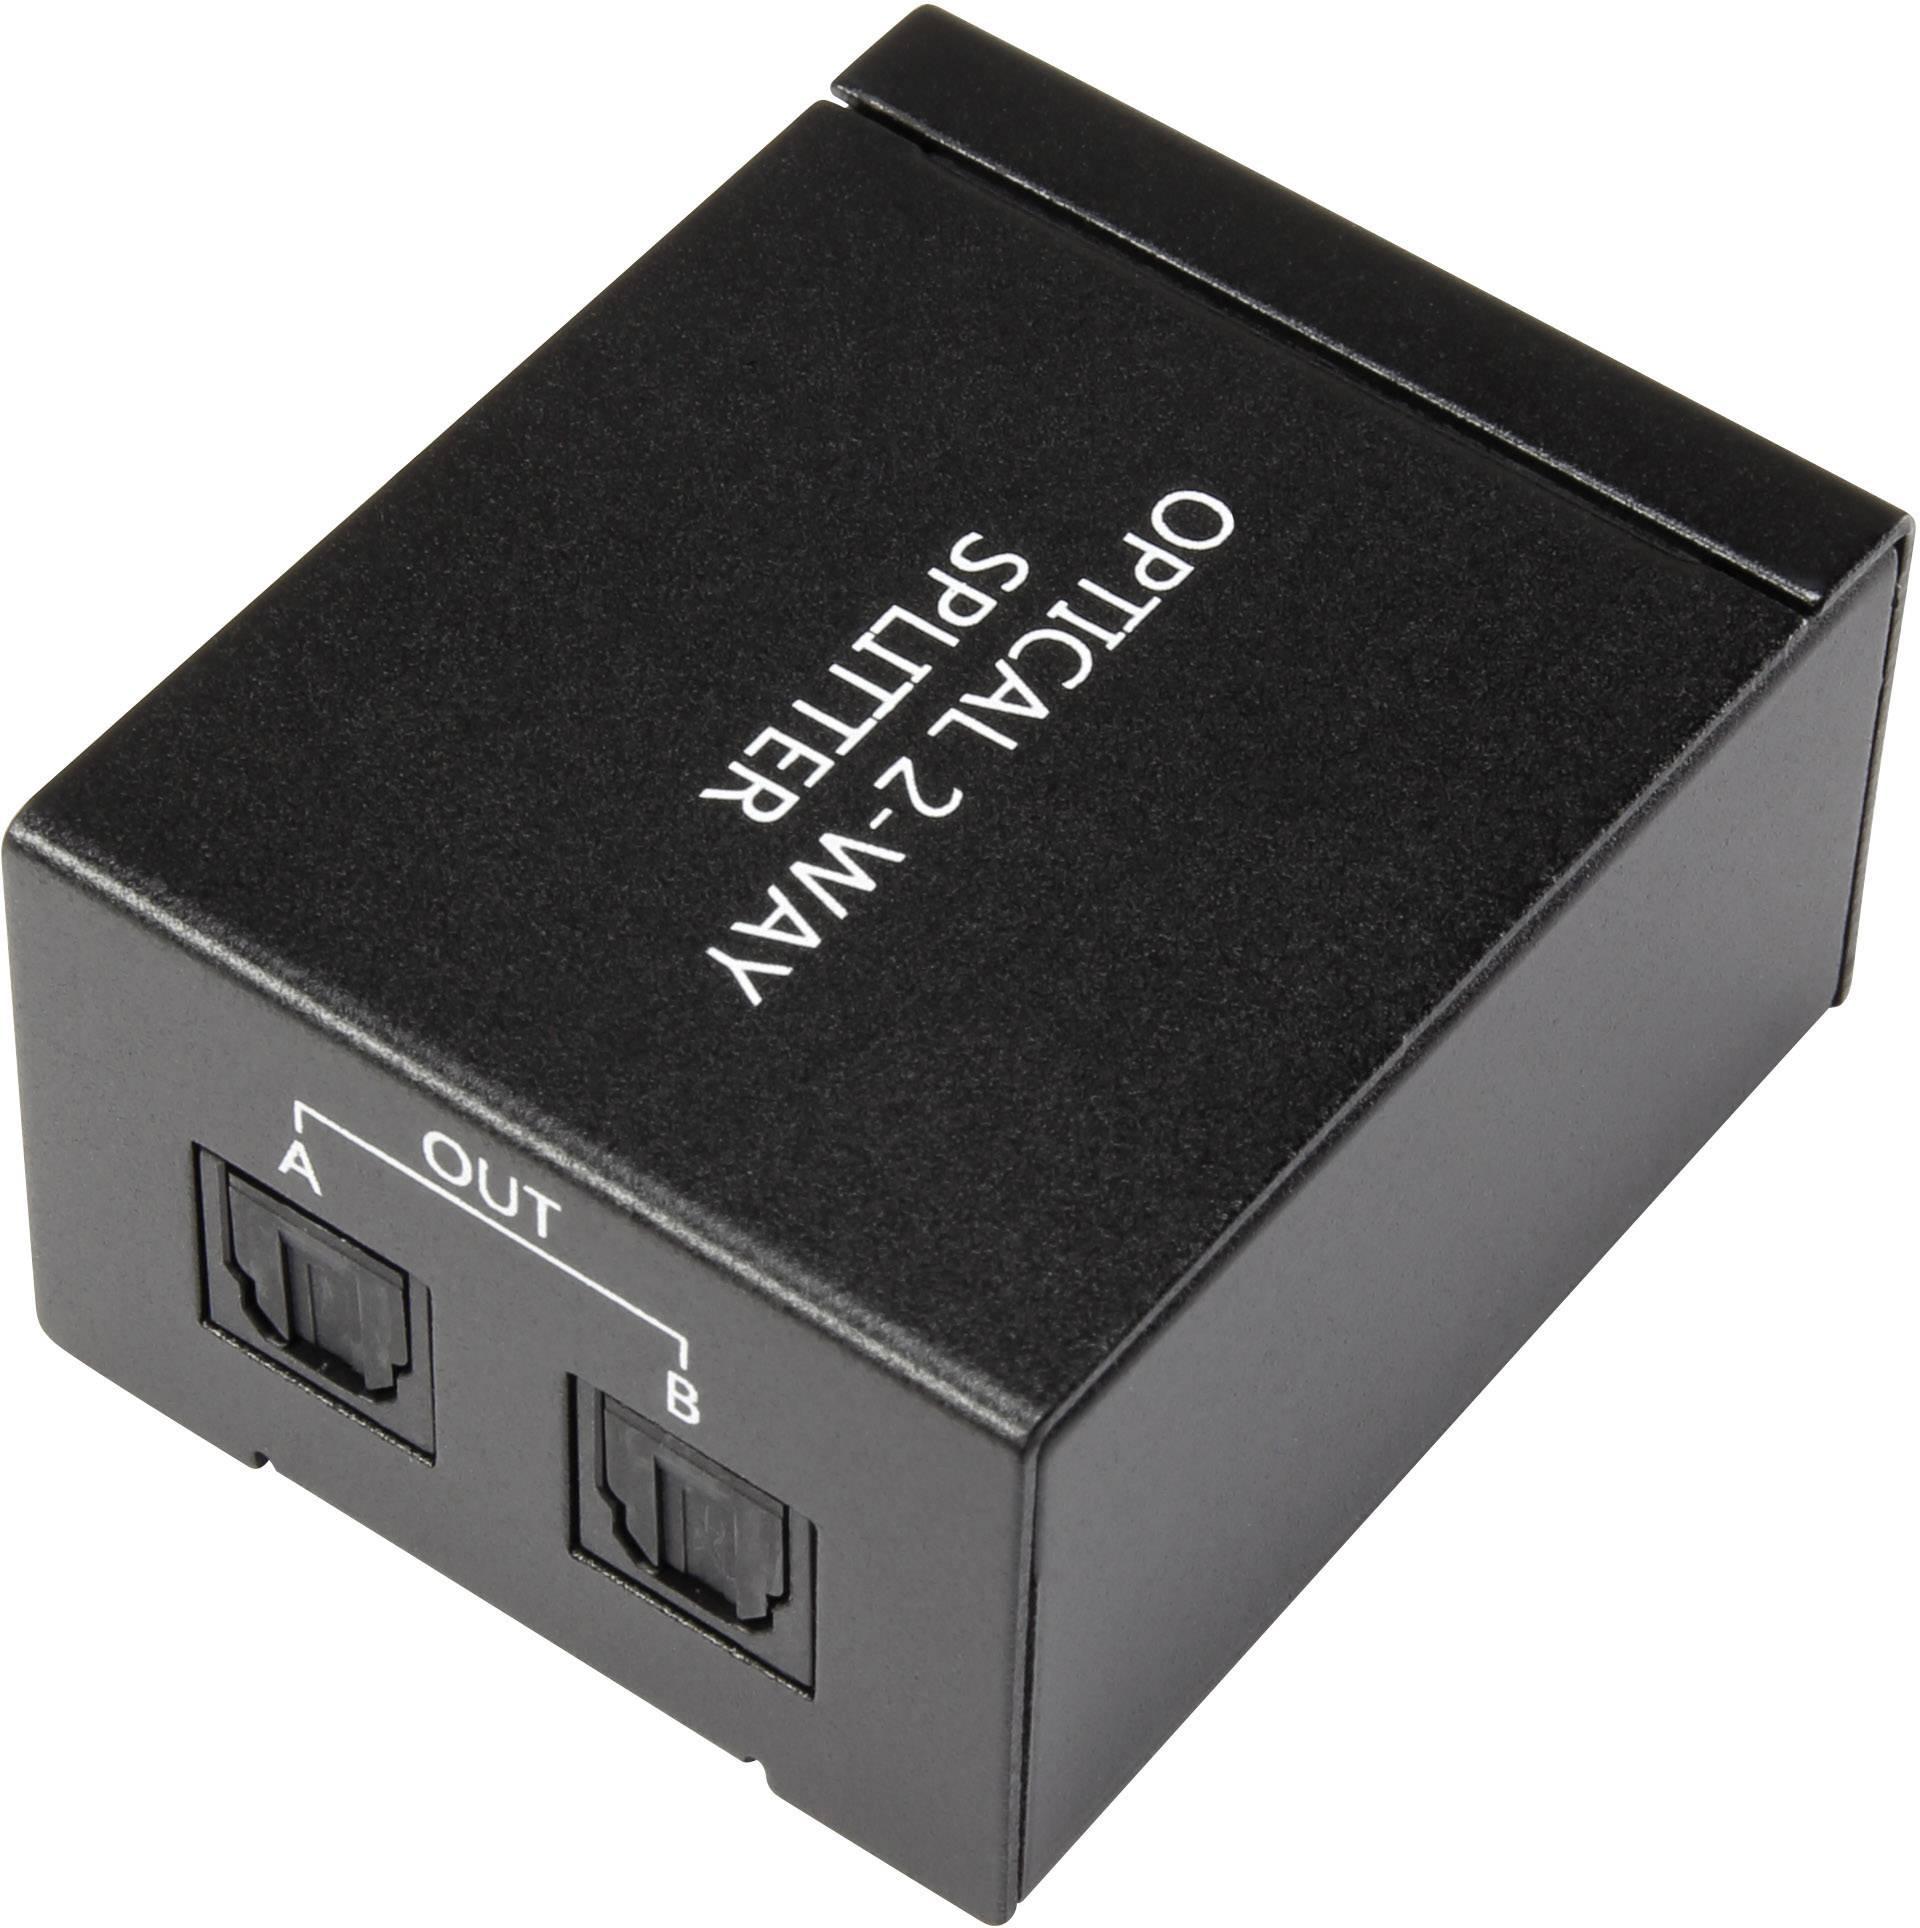 HDMI splitter Toslink SpeaKa, 2 porty, černá